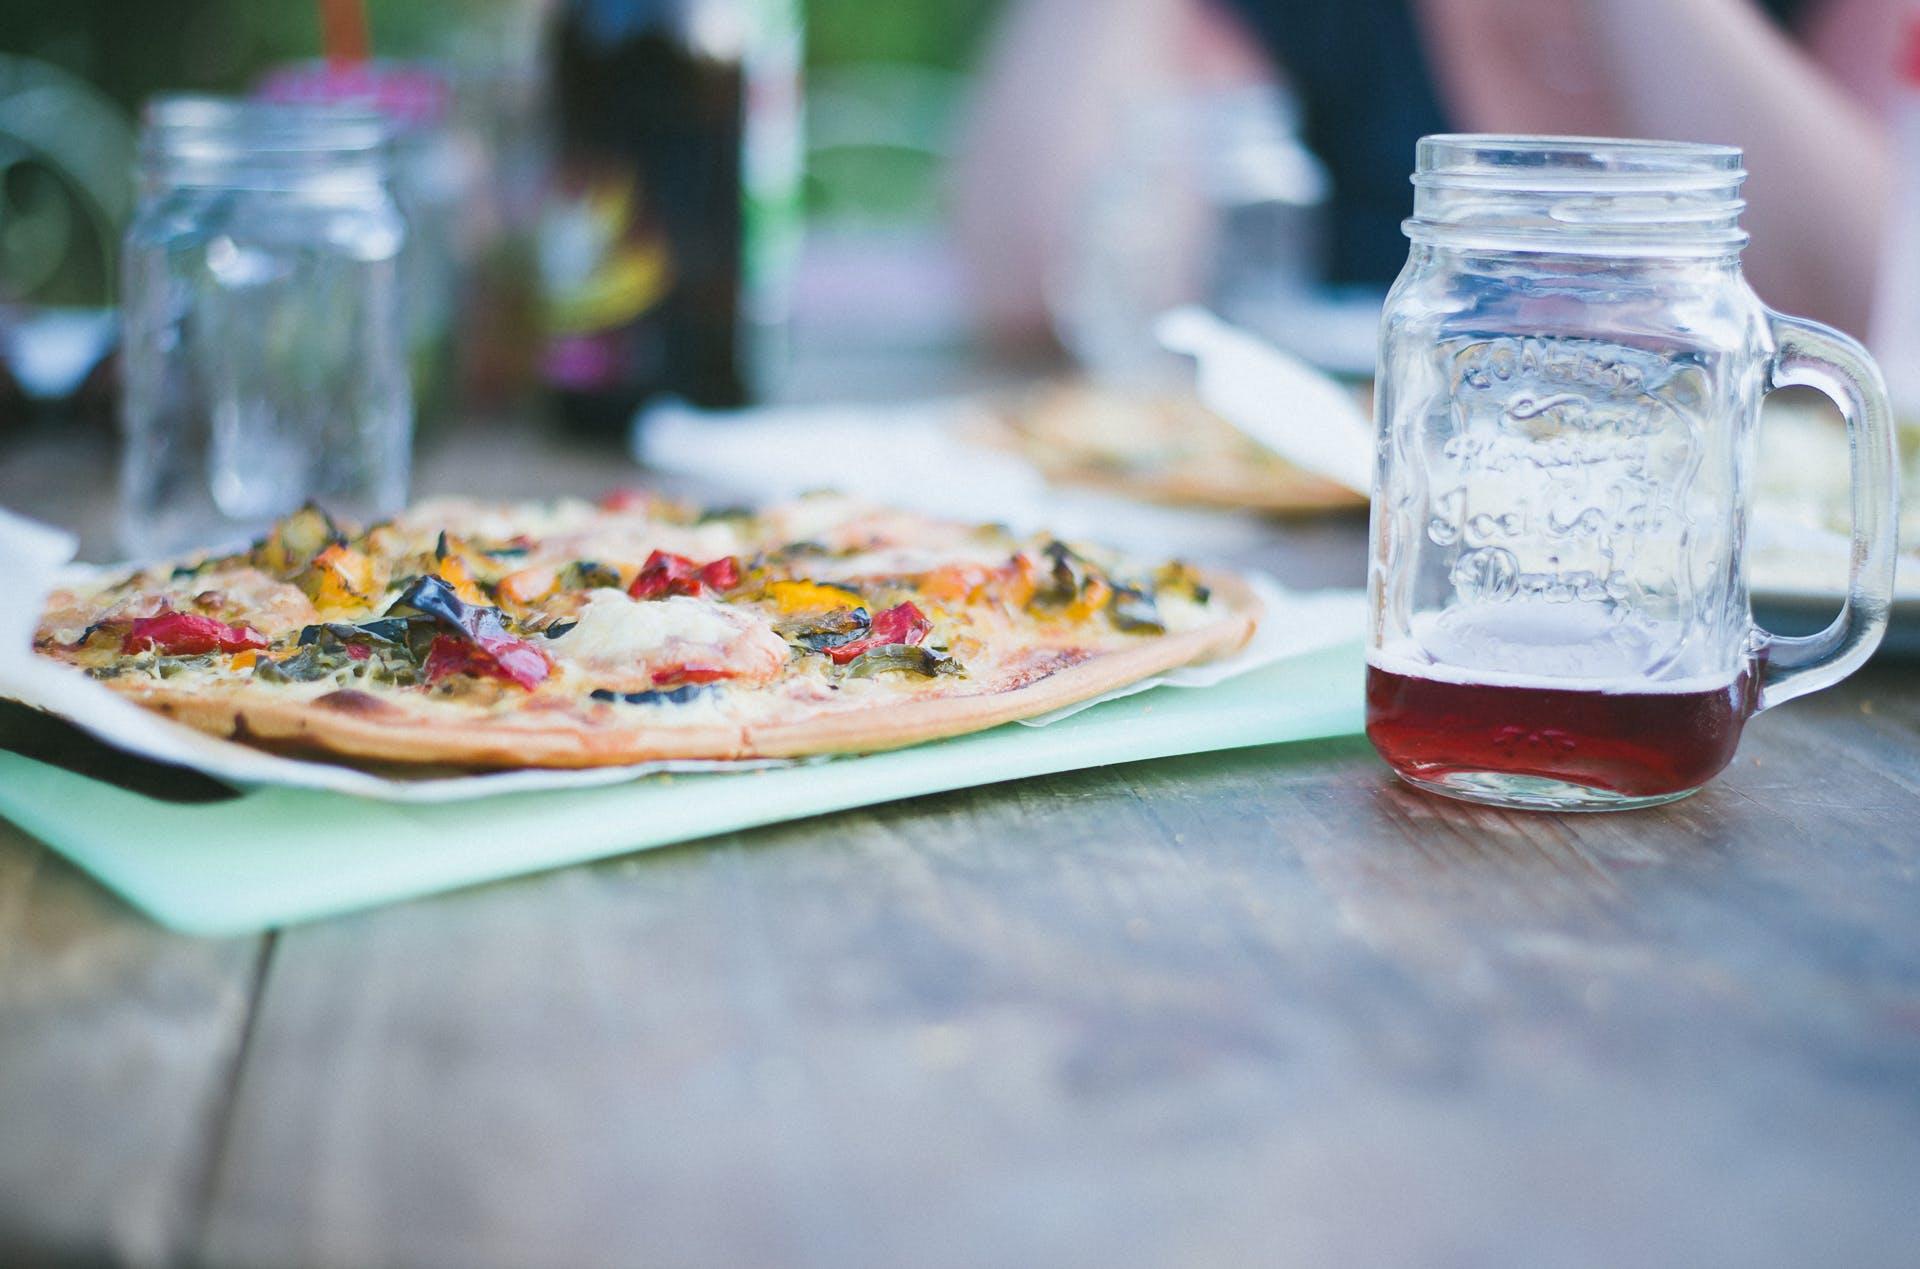 Pizza on Green Chopping Board Near Two Clear Glass Mugs